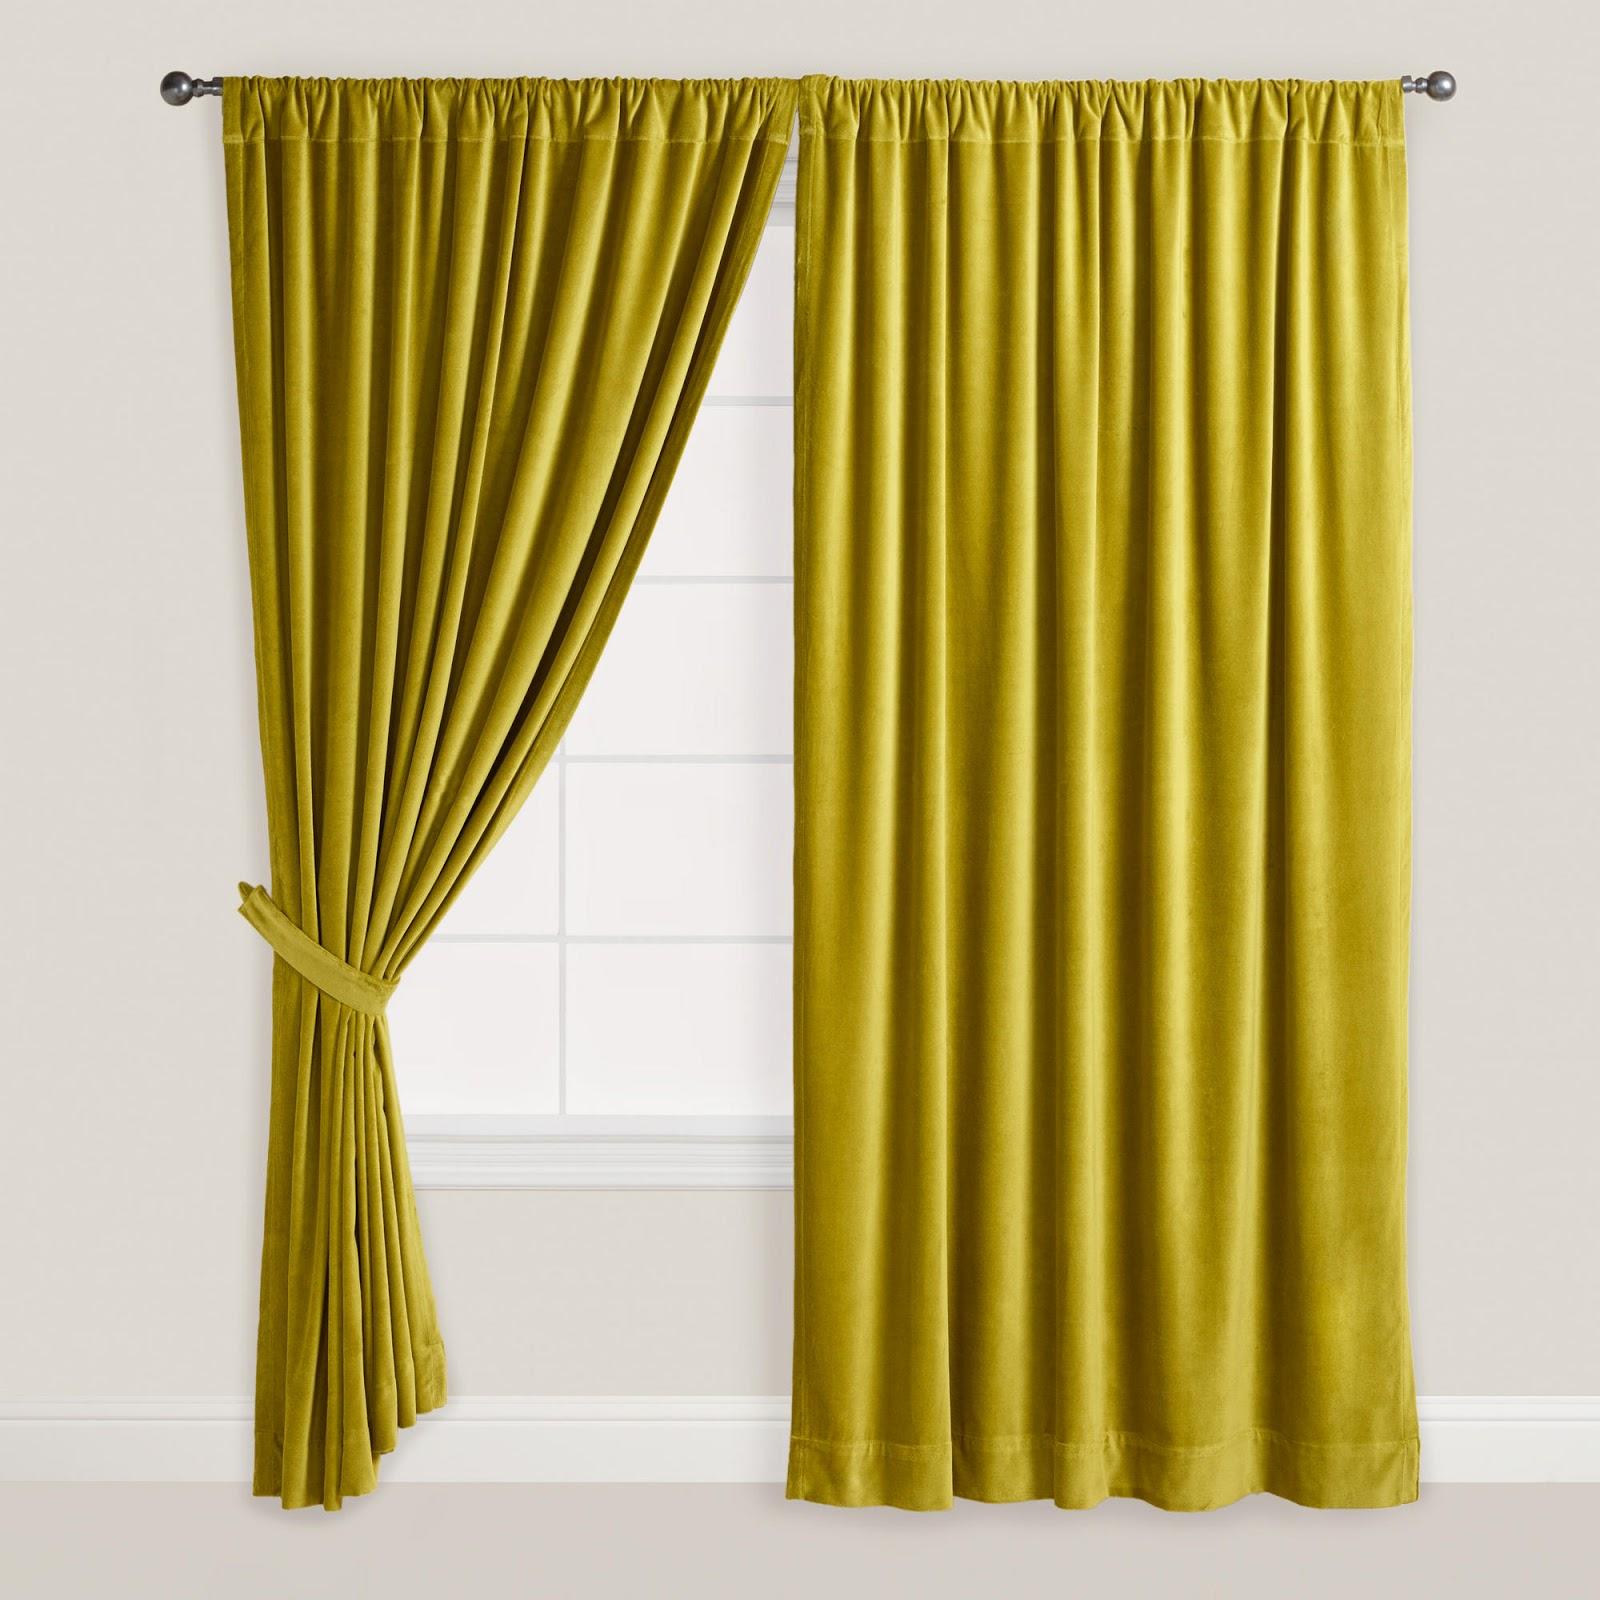 Curtain Desighns Design20132014 For Bedroom